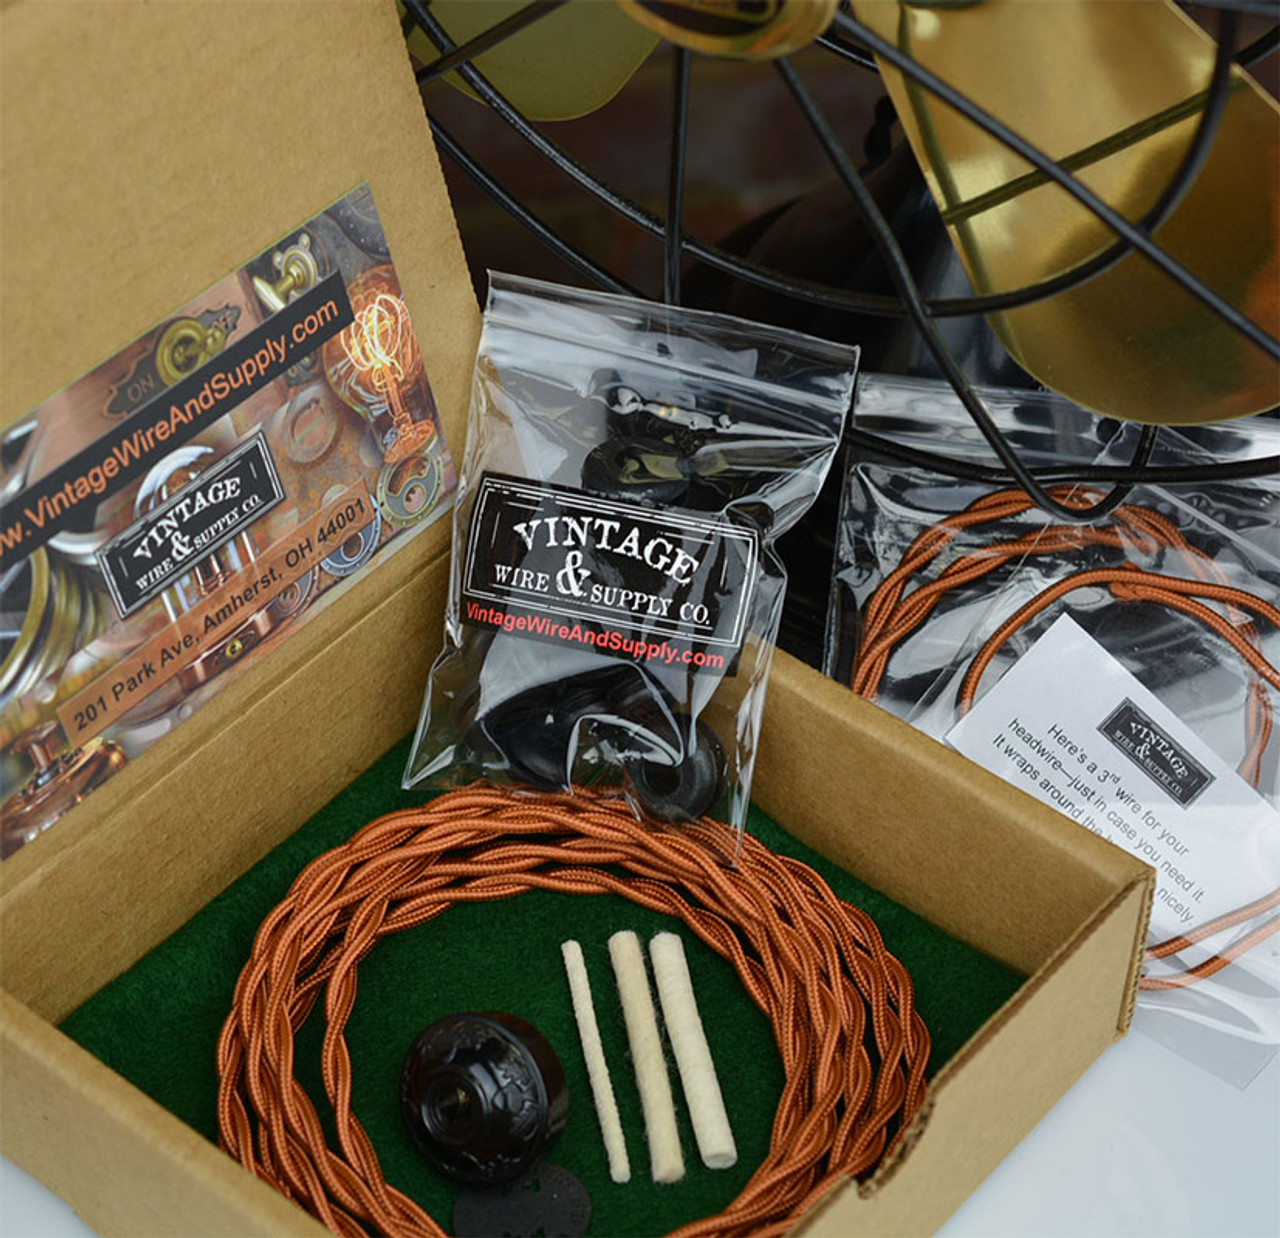 Antique Fan Restoration Kit Vintage Wire Supply